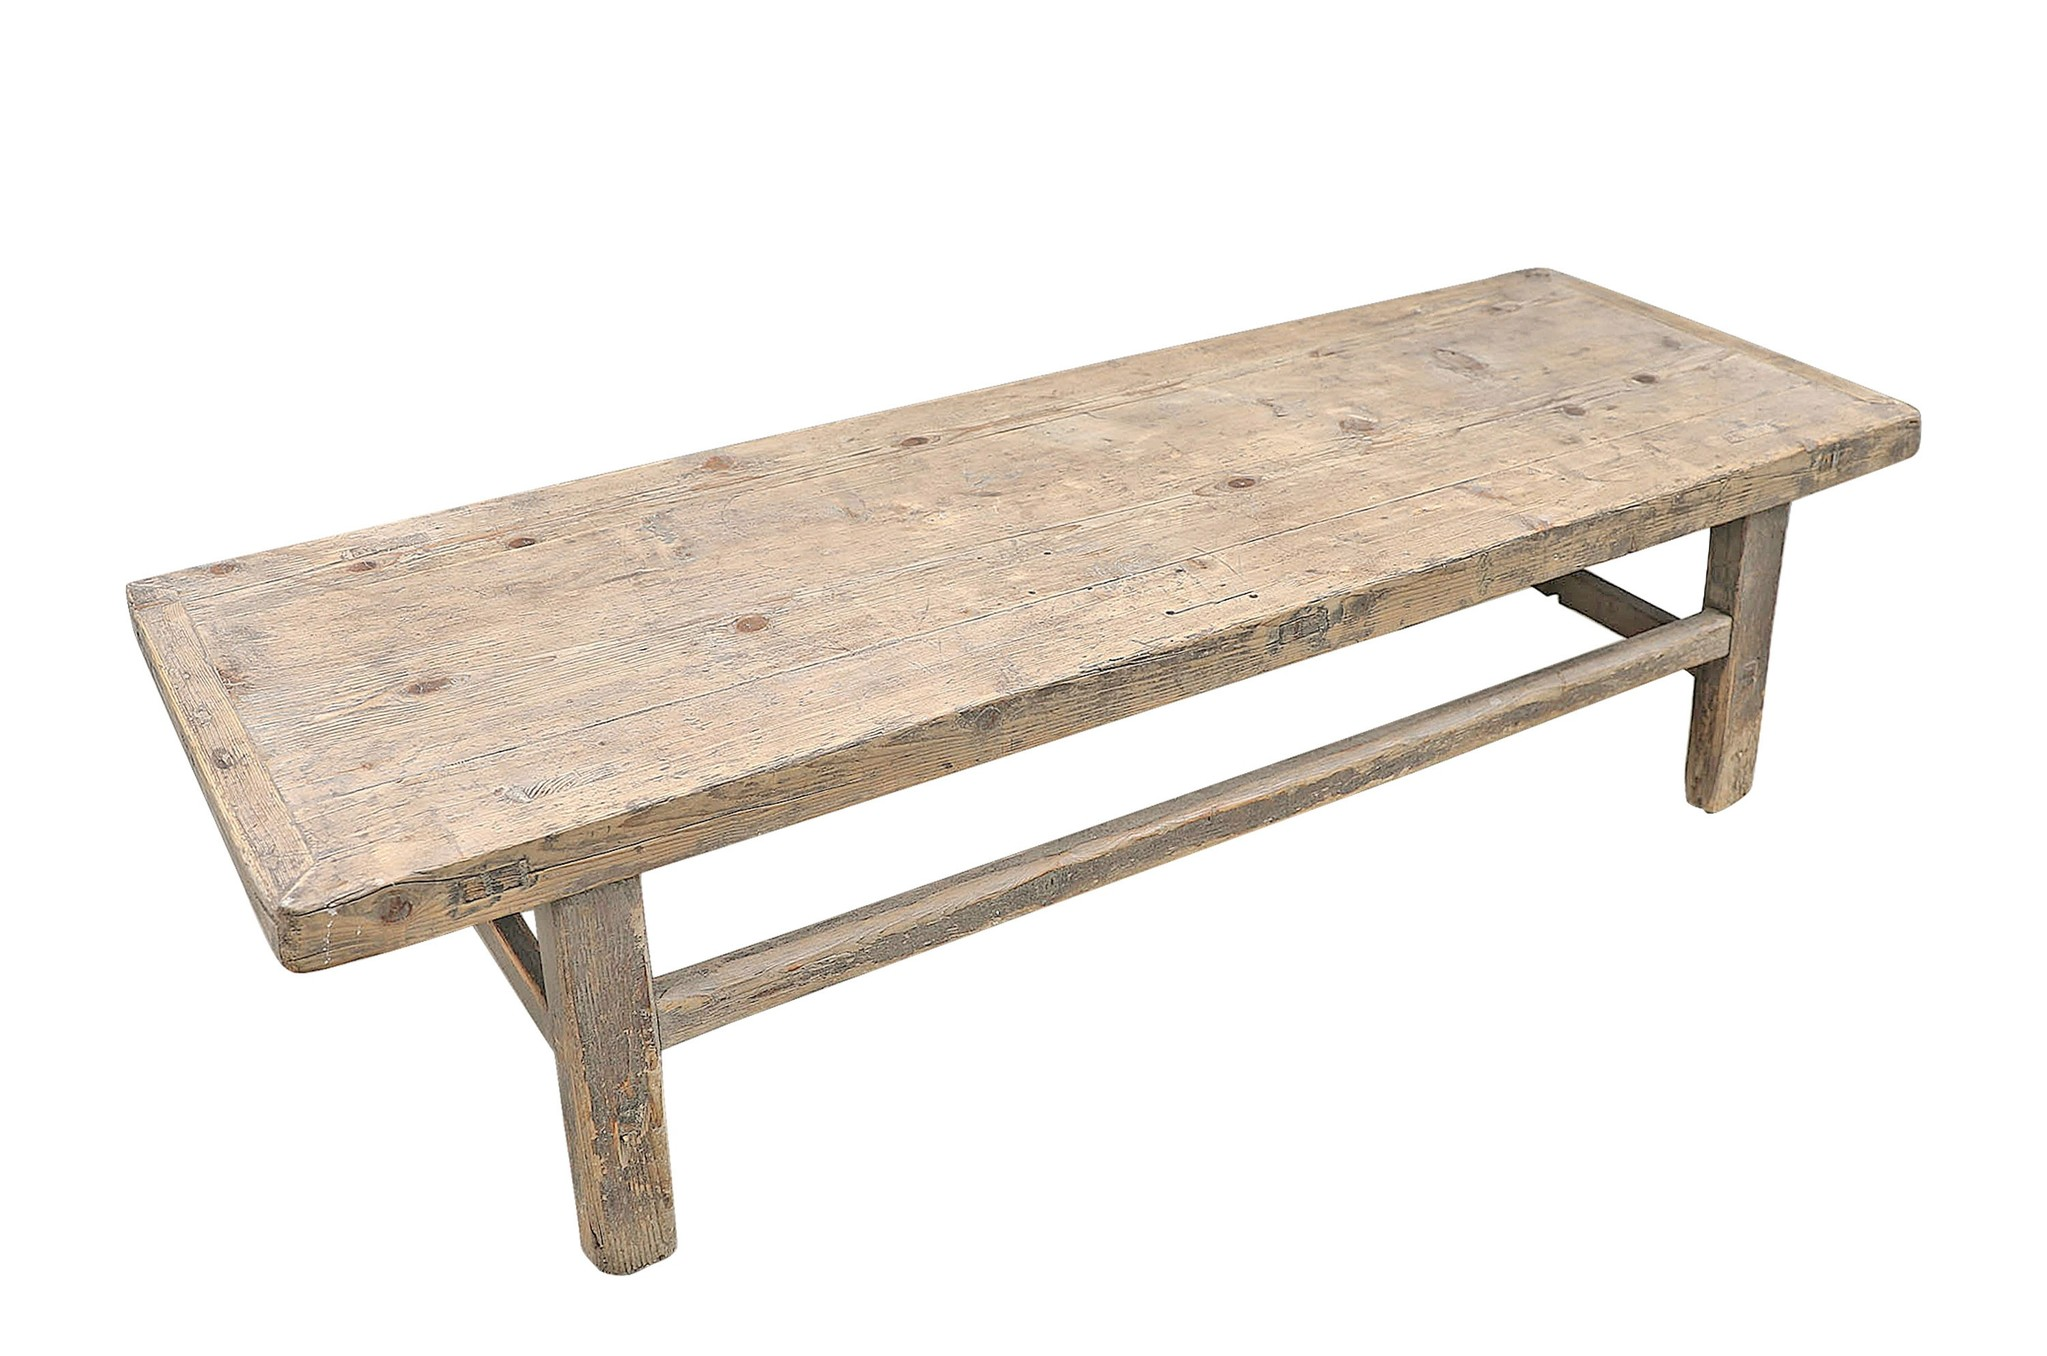 Snowdrops Copenhagen Natural coffee table - 164x56xh42cm - Elm Wood  - SOLD